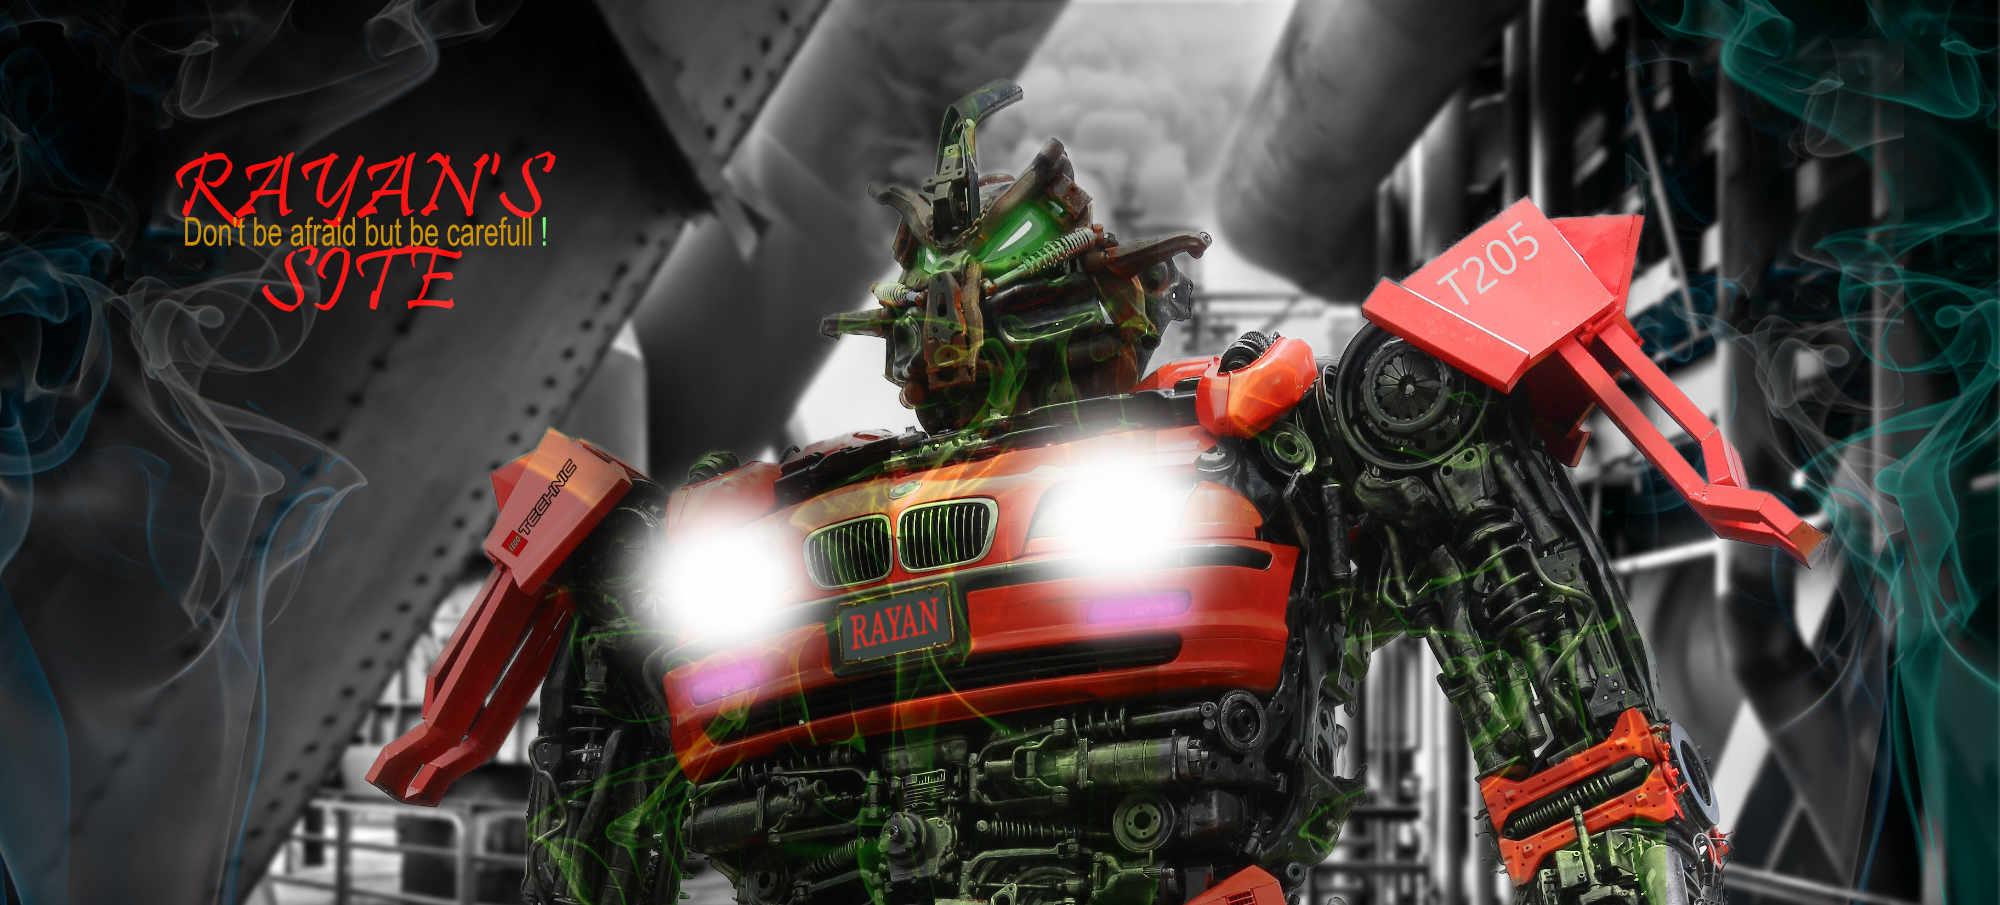 Rayan's website header Robot thema